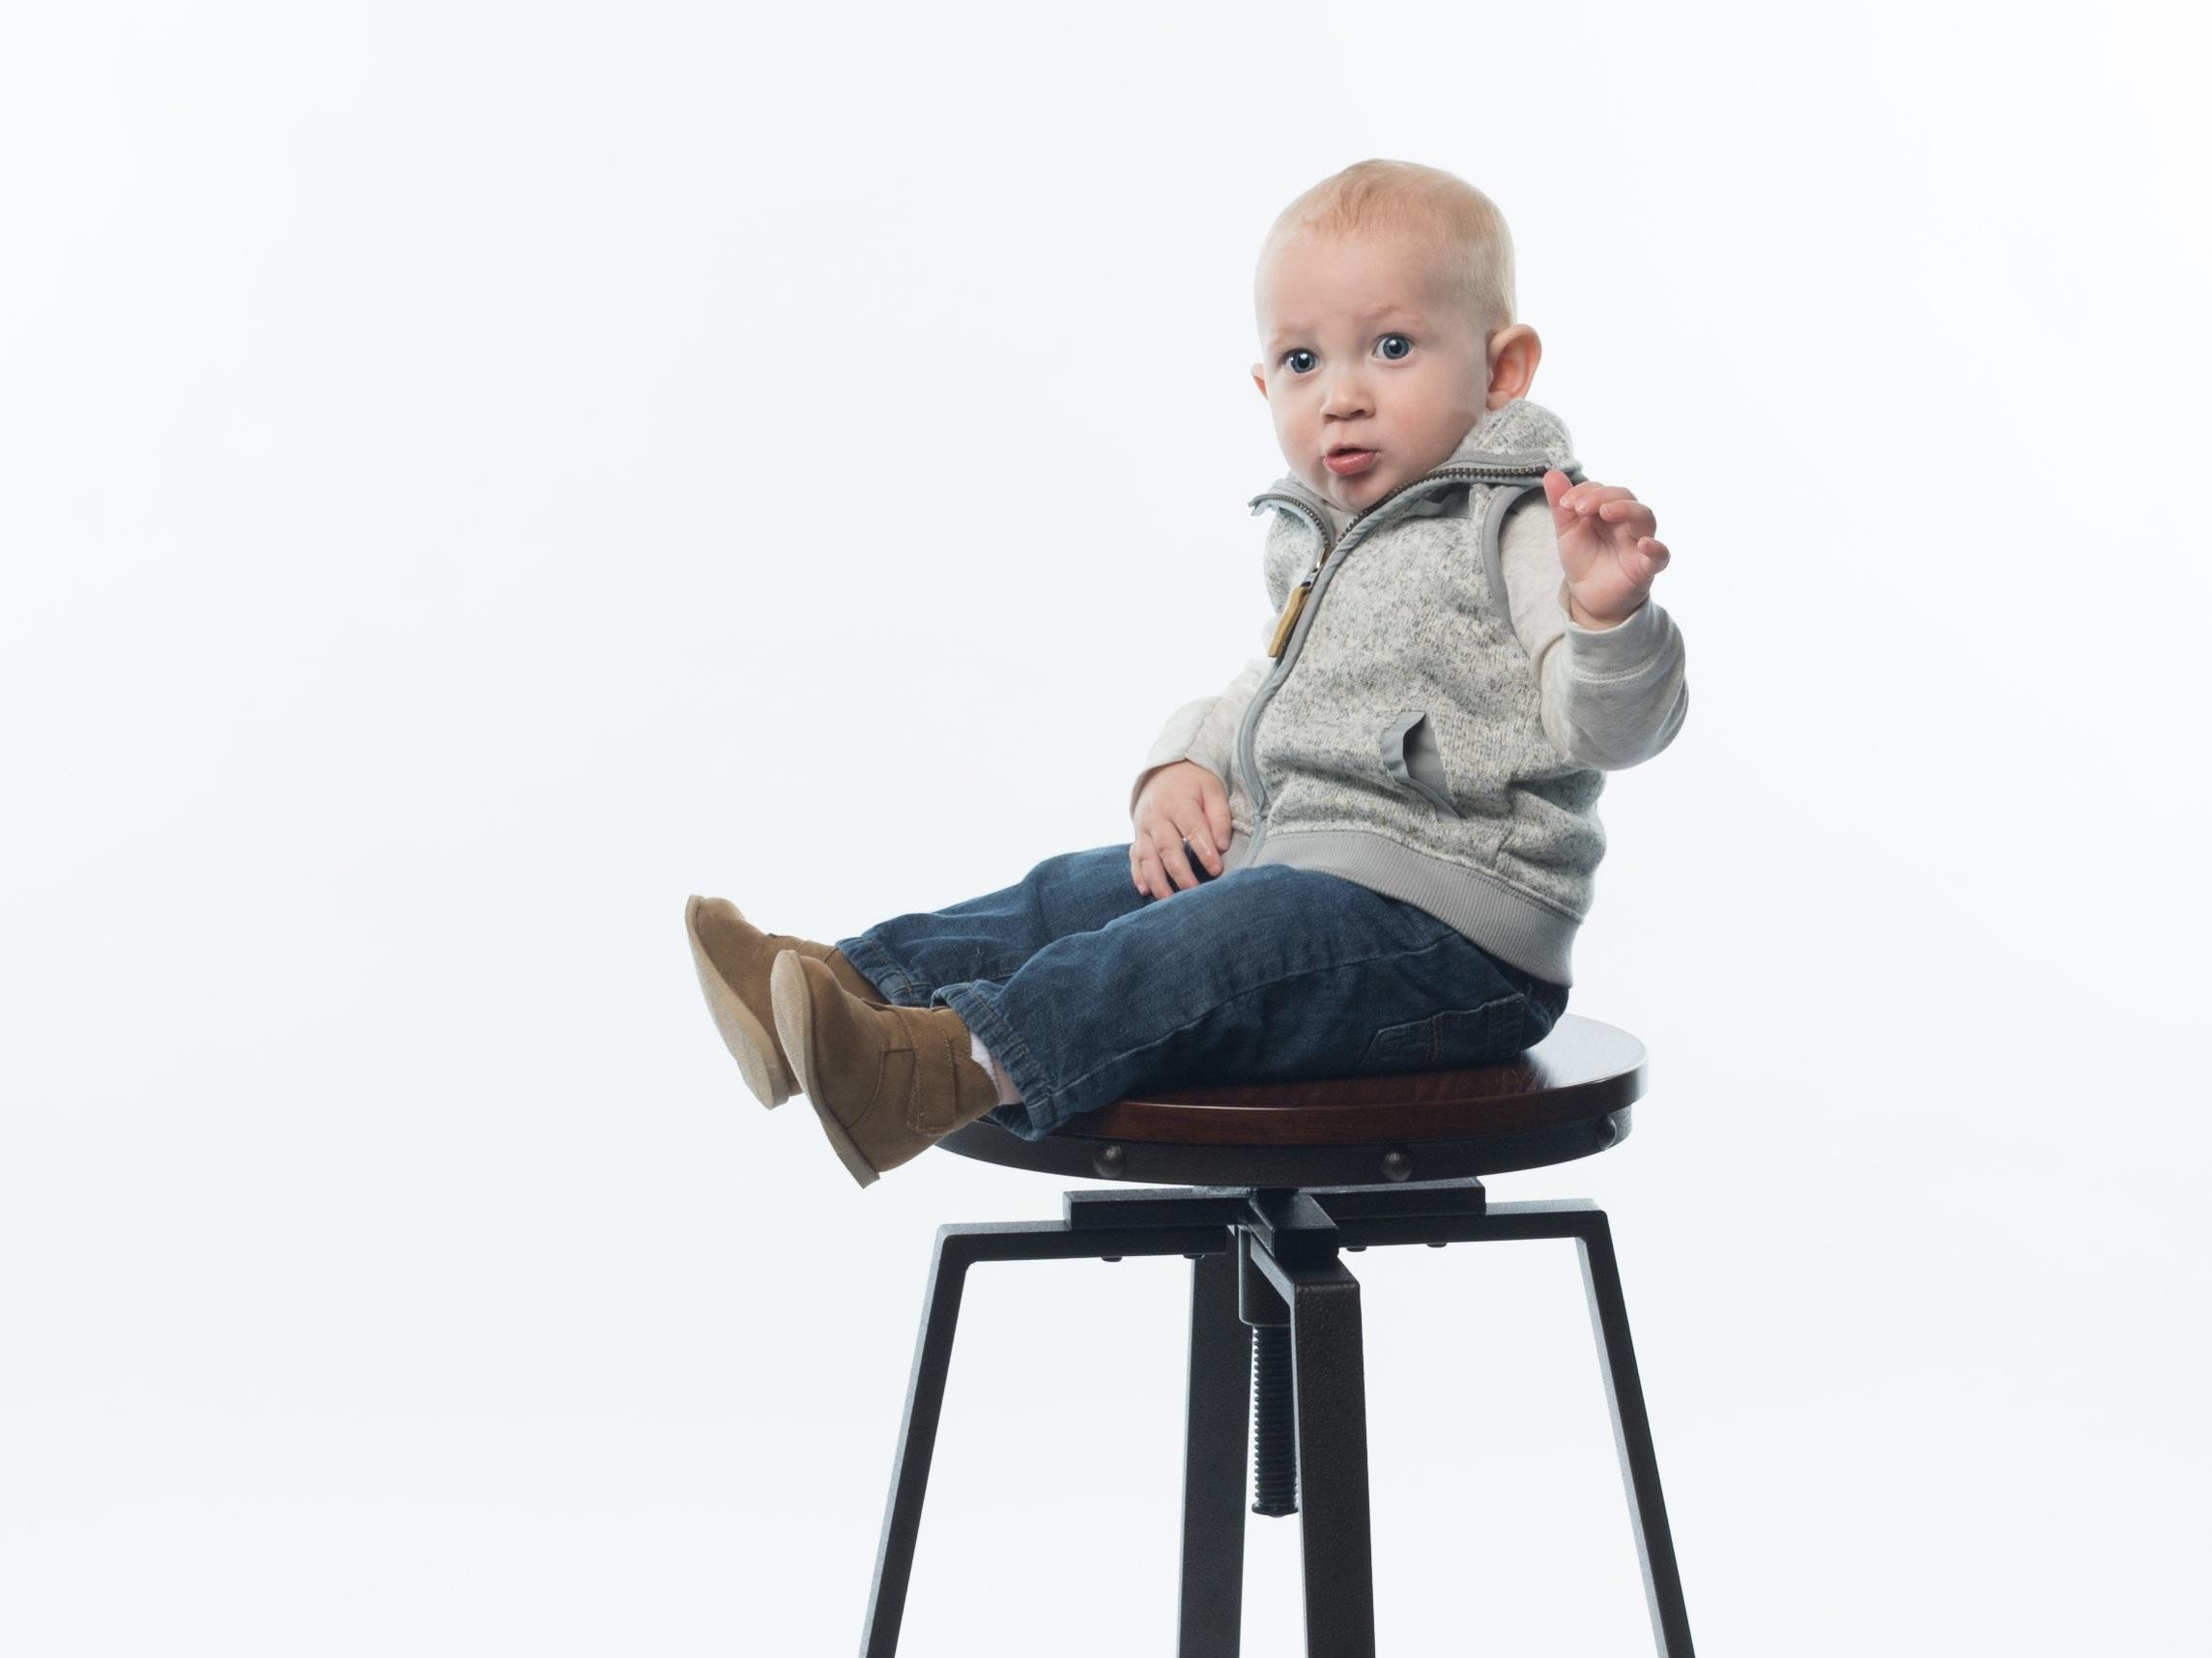 baby-boy-chair-961181.jpg